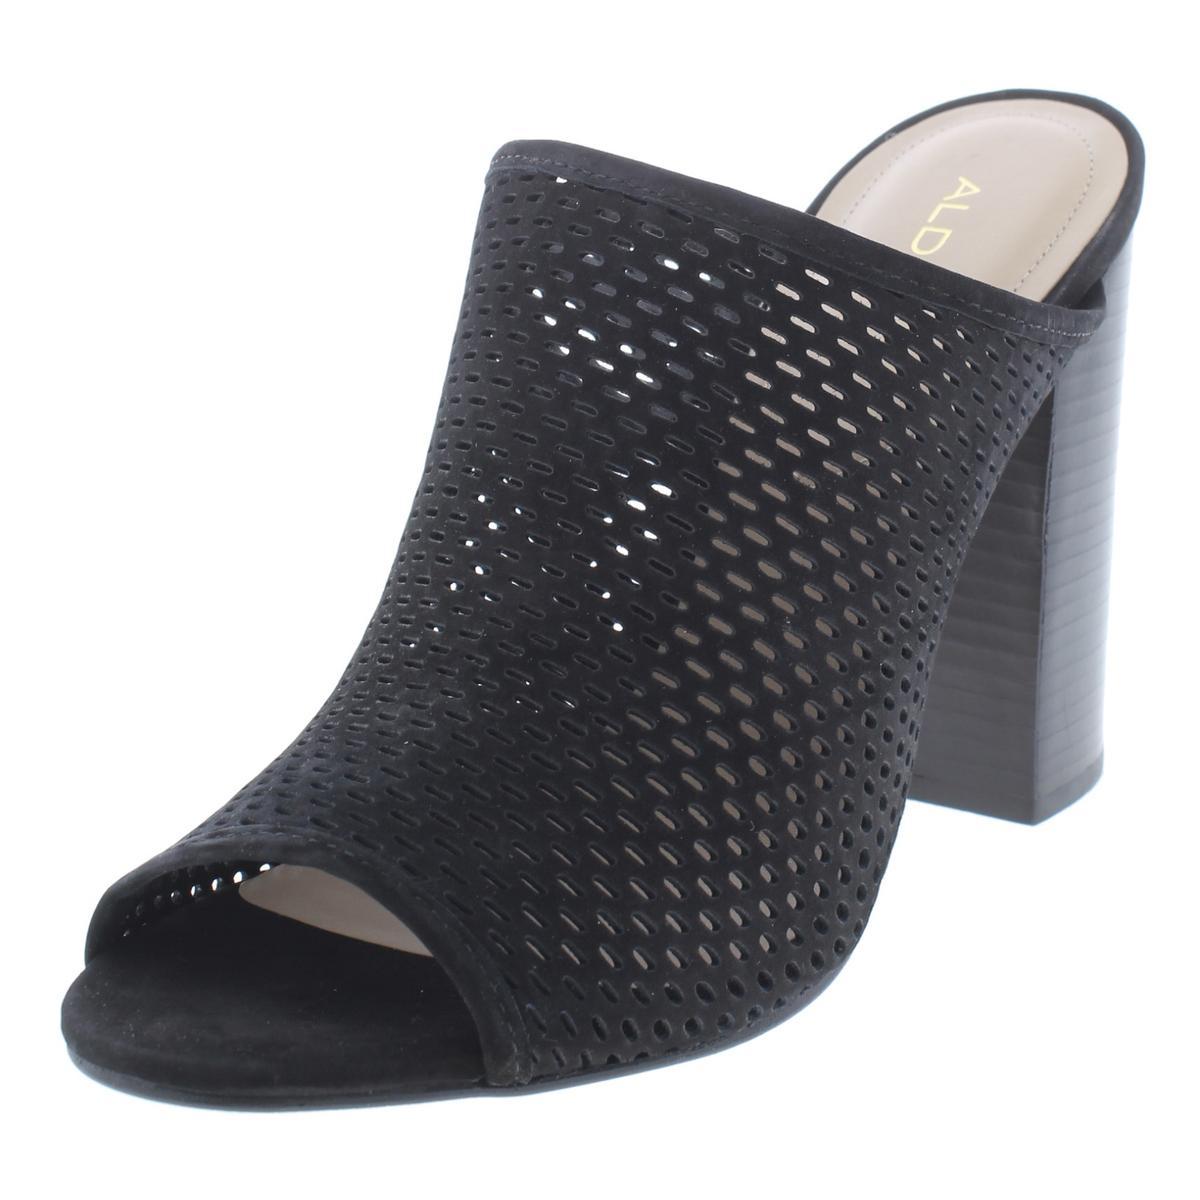 0cc33816d56 Aldo Womens Thiasa Black Leather Slide Sandals Shoes 8.5 Medium (B